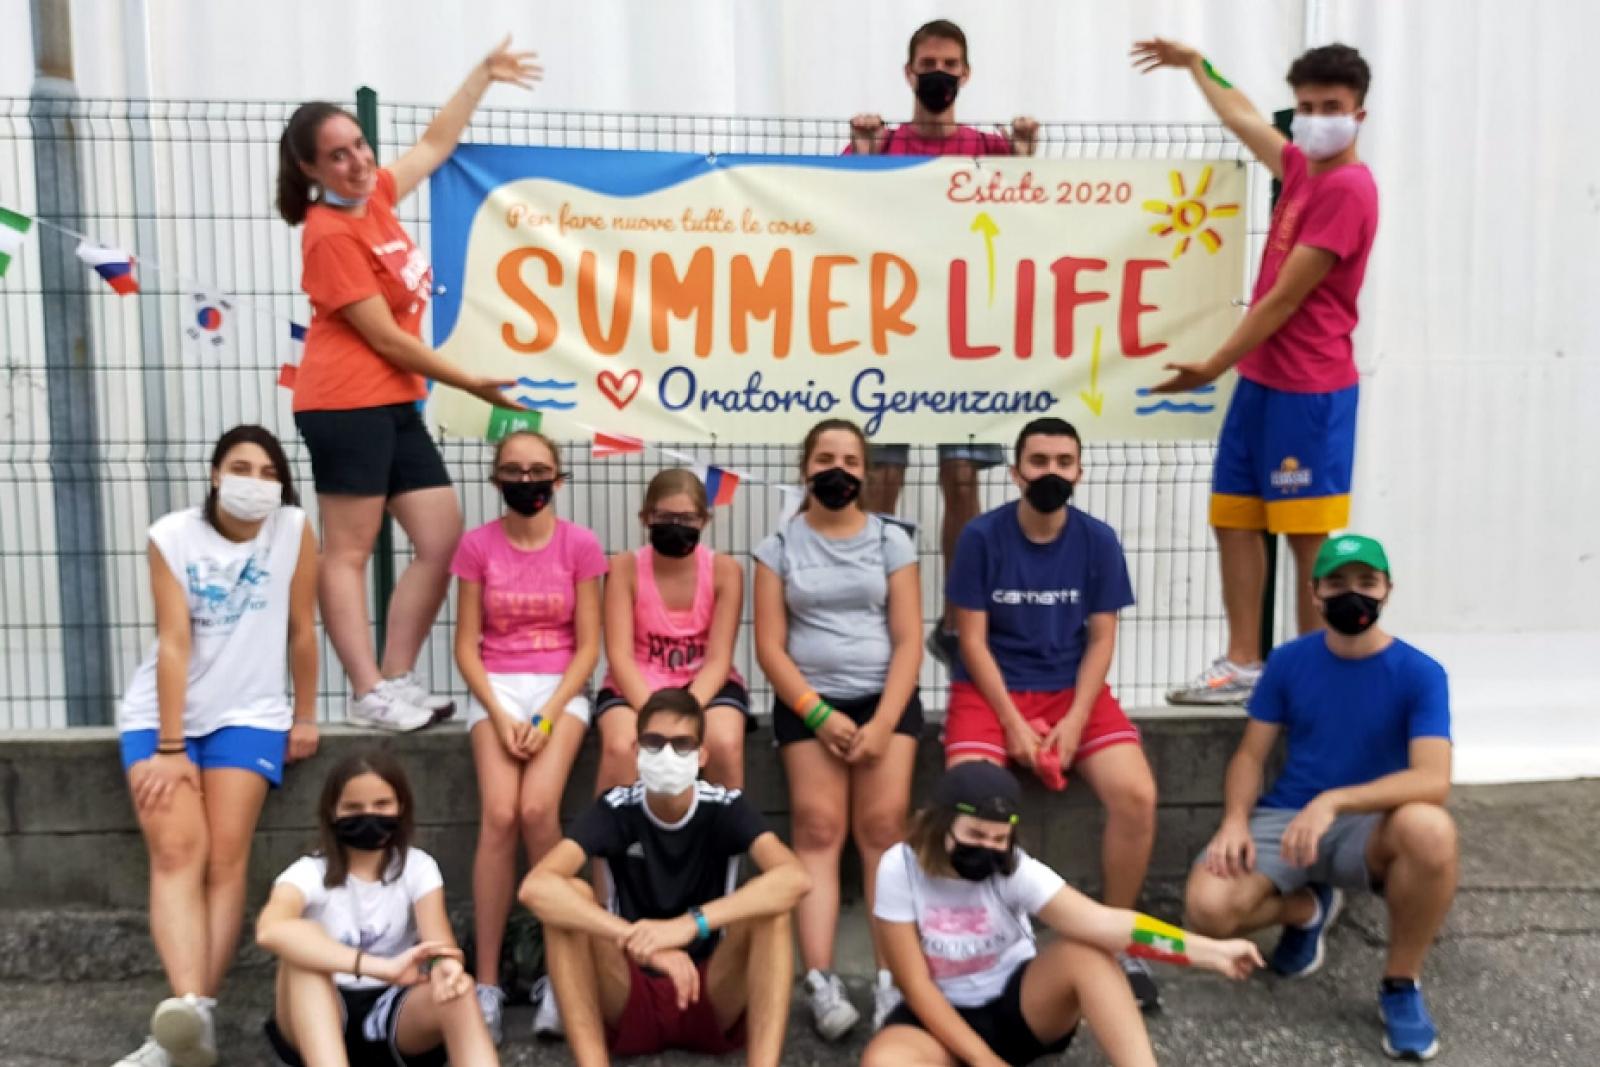 summerlife-articoli-2